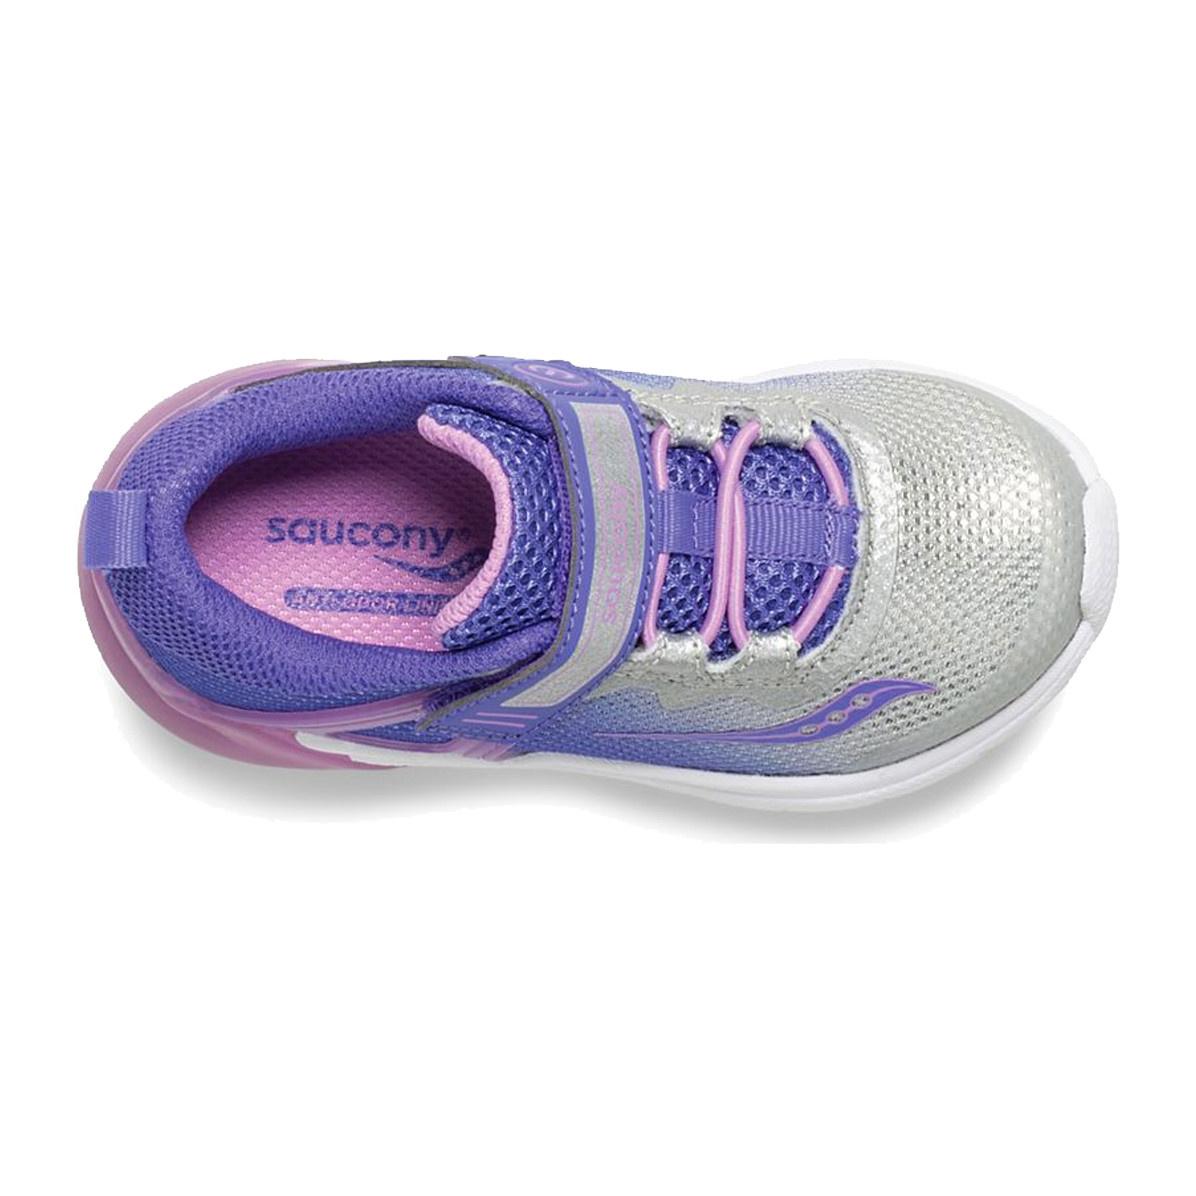 Saucony Saucony Child Flash Glow Purple/Silver